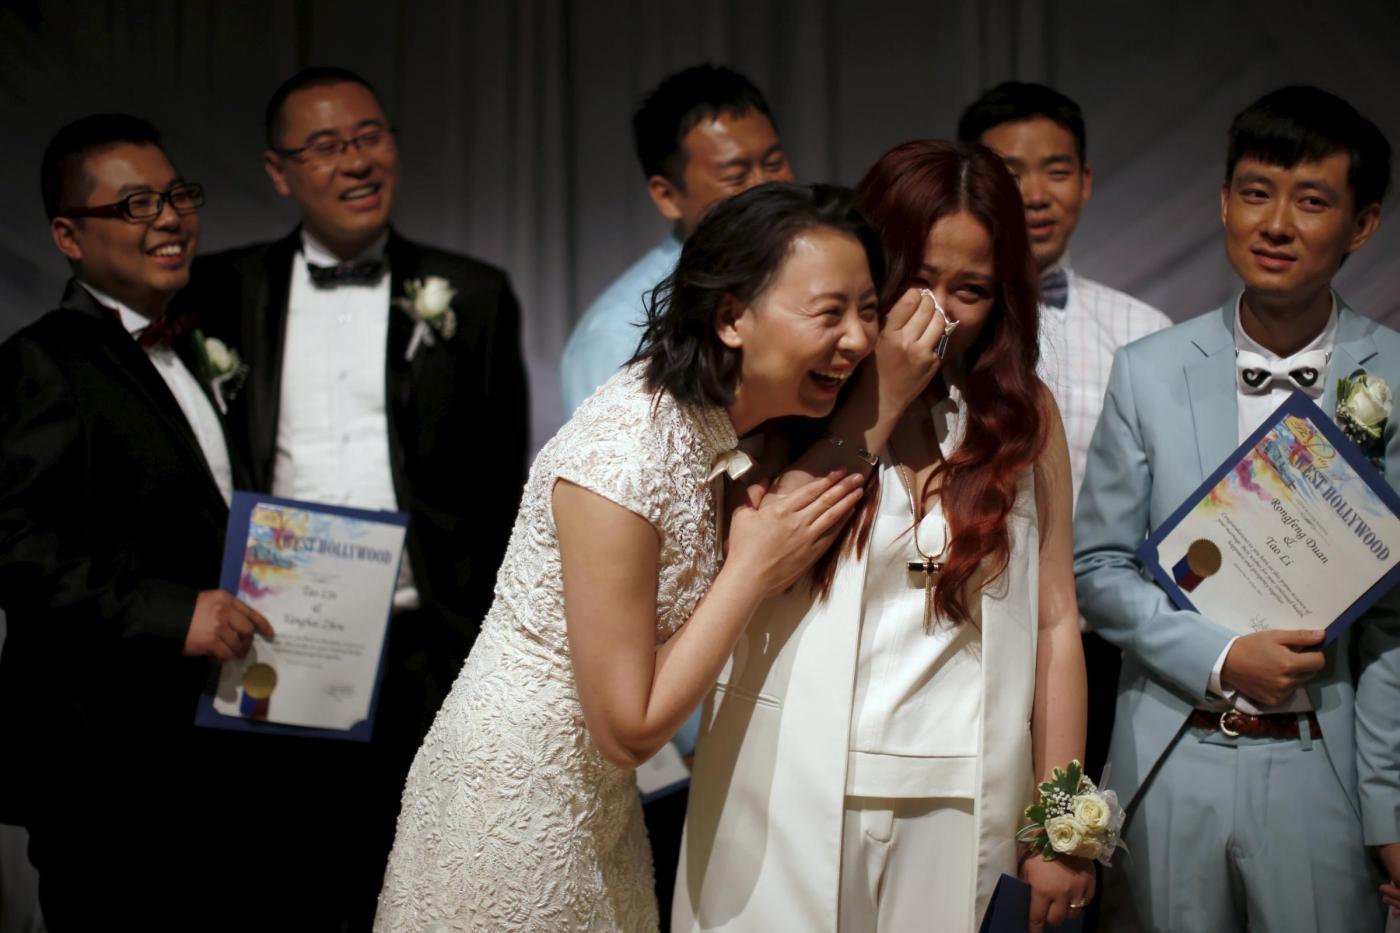 Sette coppie omosessuali cinesi si sposano a Los Angeles7